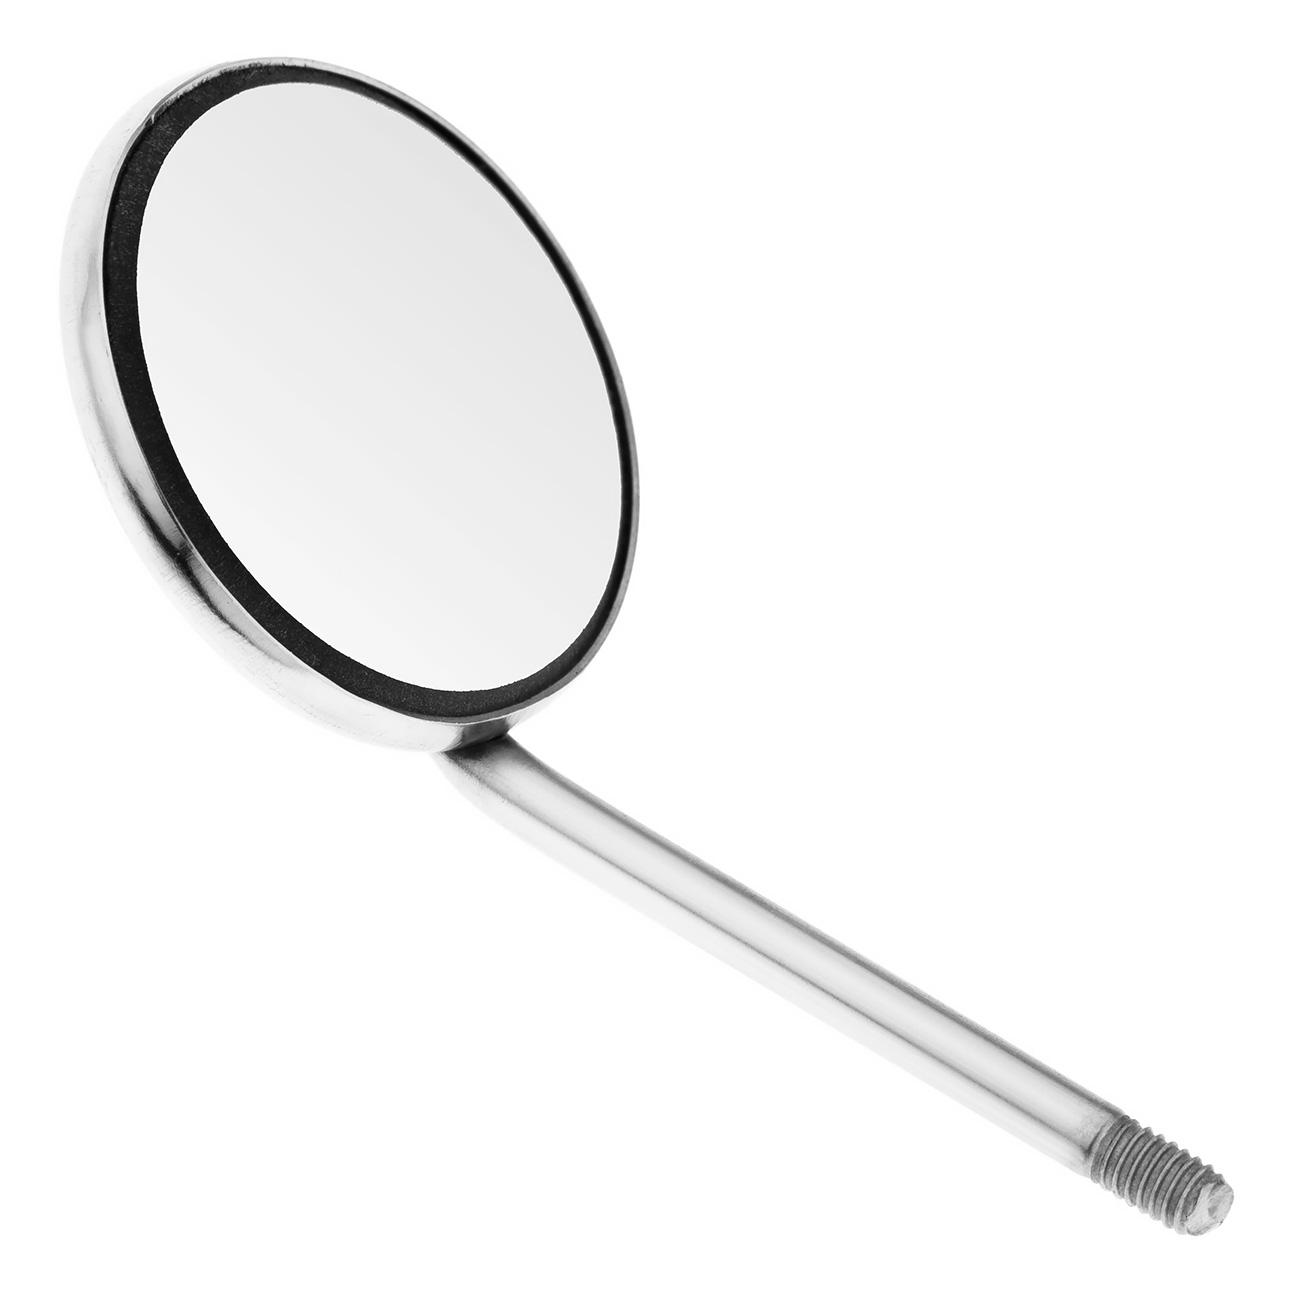 23-5 Зеркало стом.родий 4 22мм 1шт